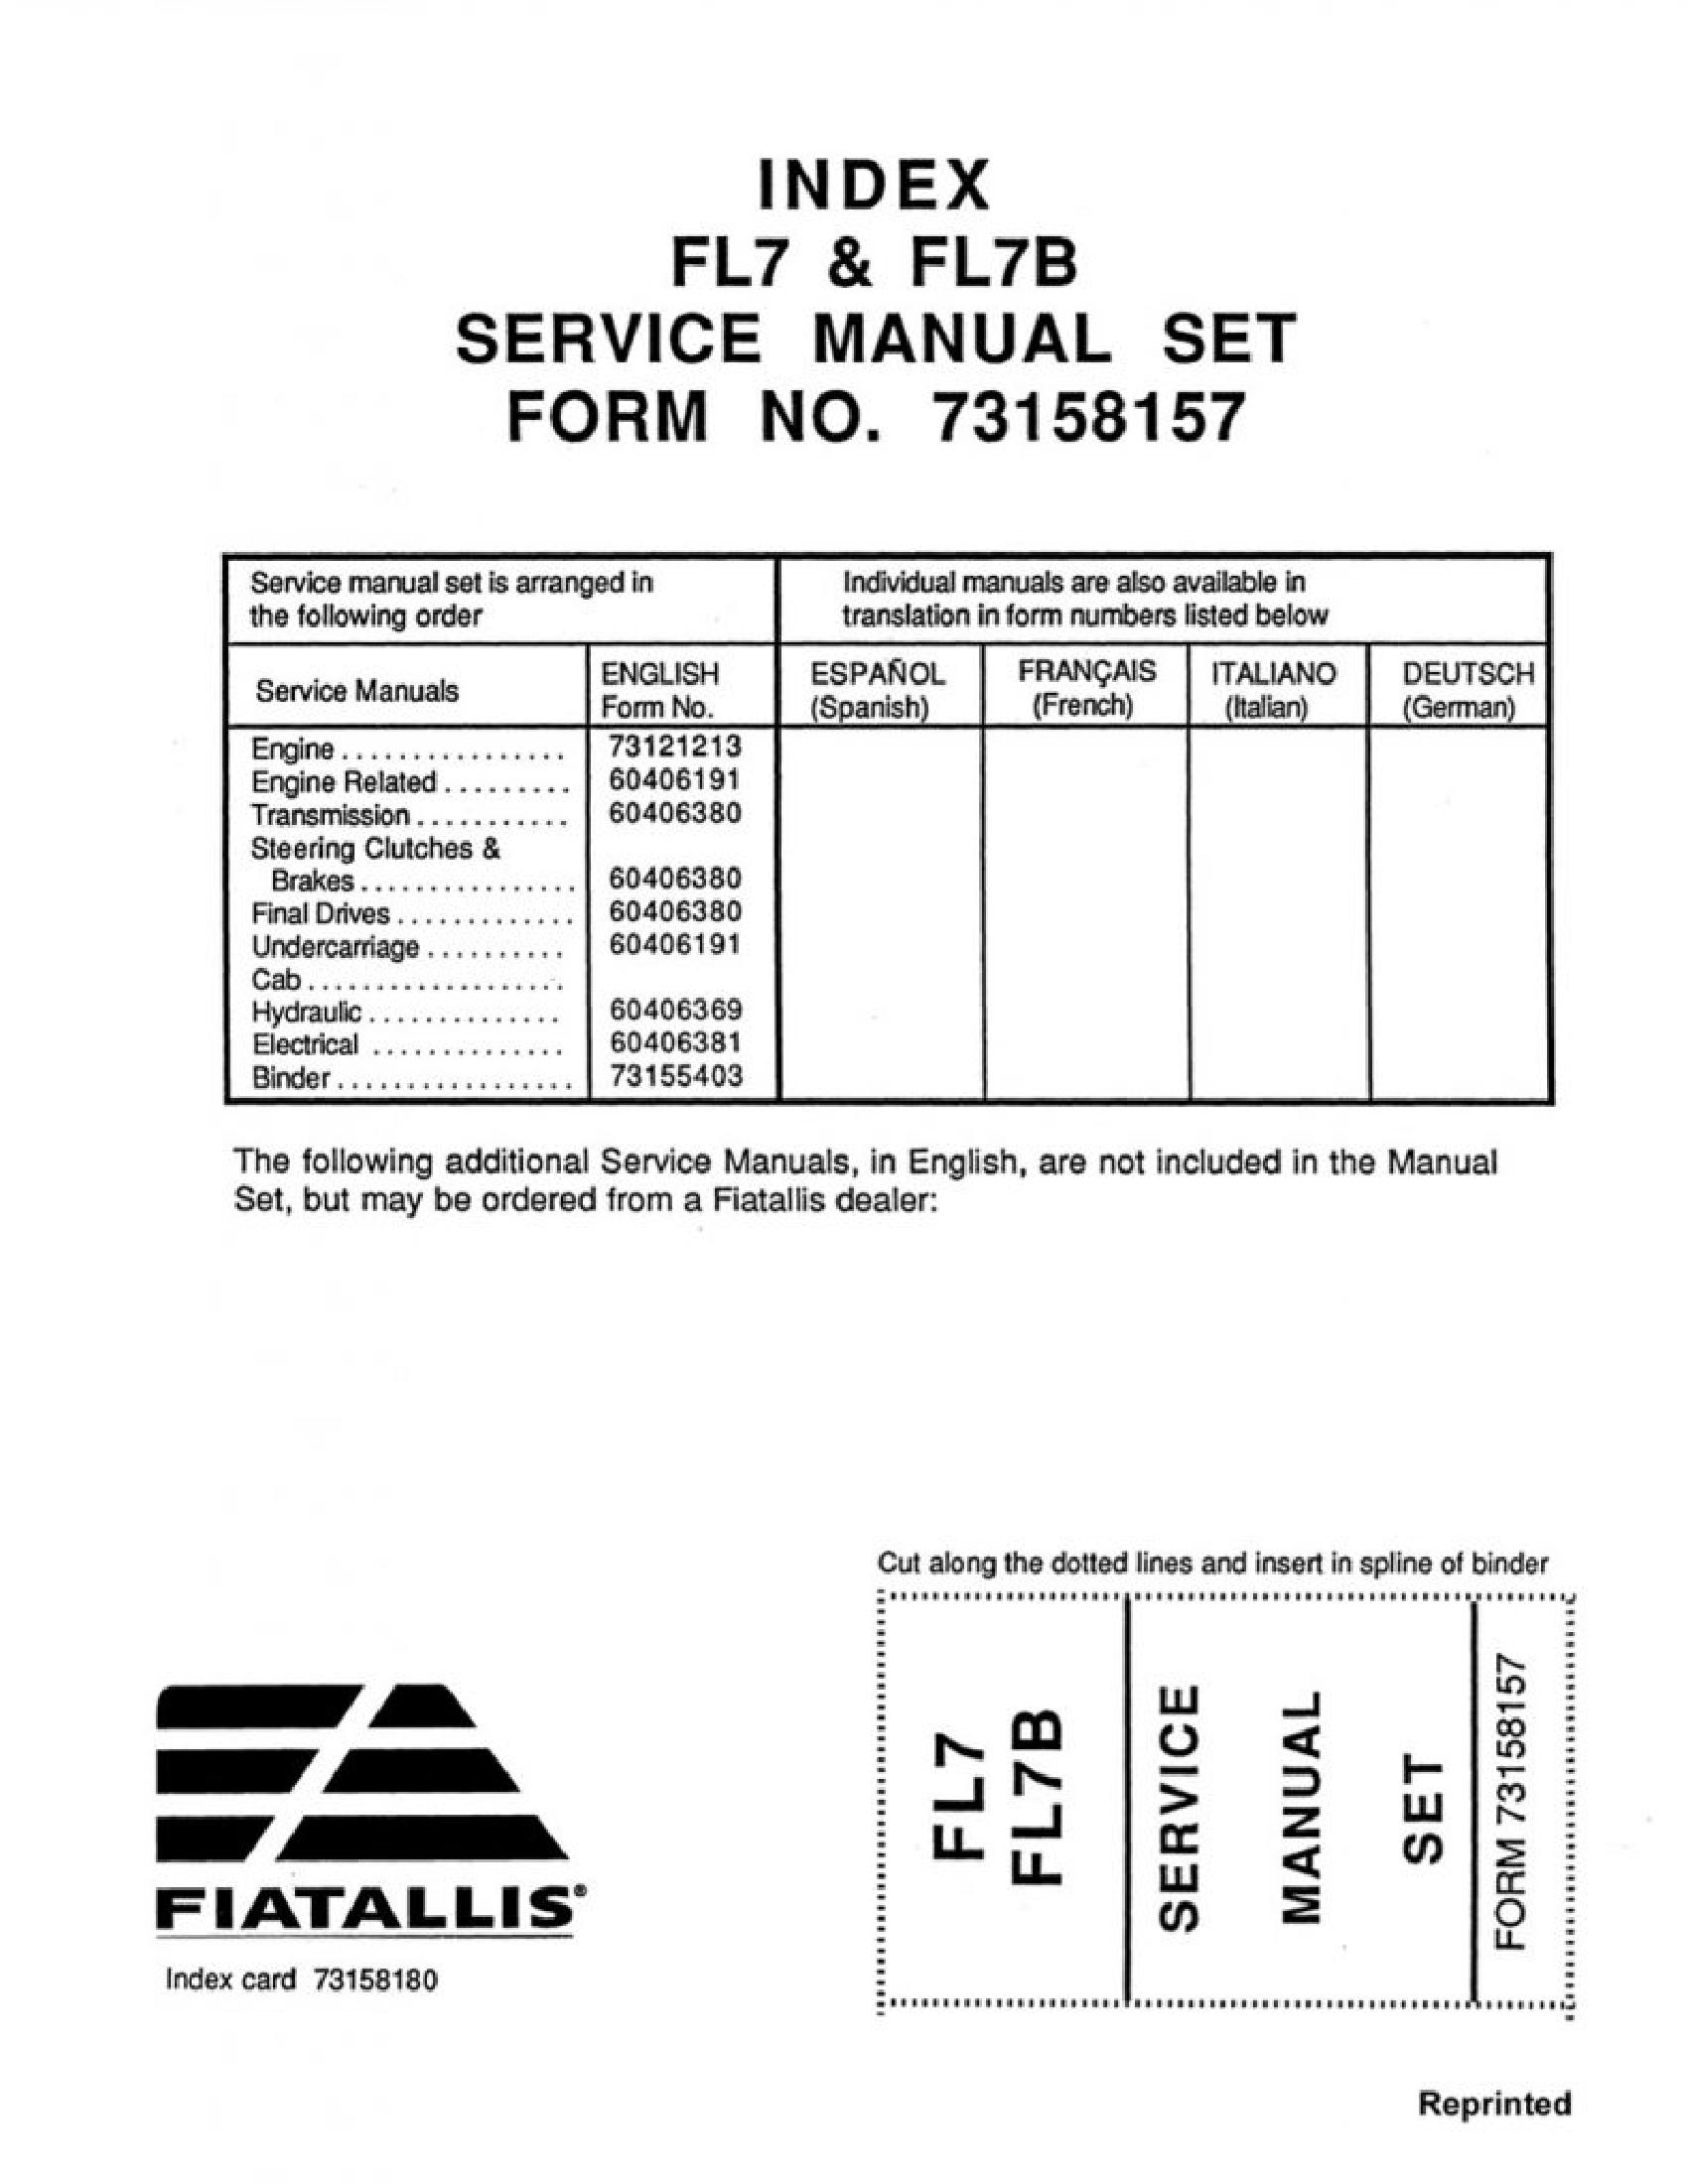 Fiat-Allis FL7 Dozer manual